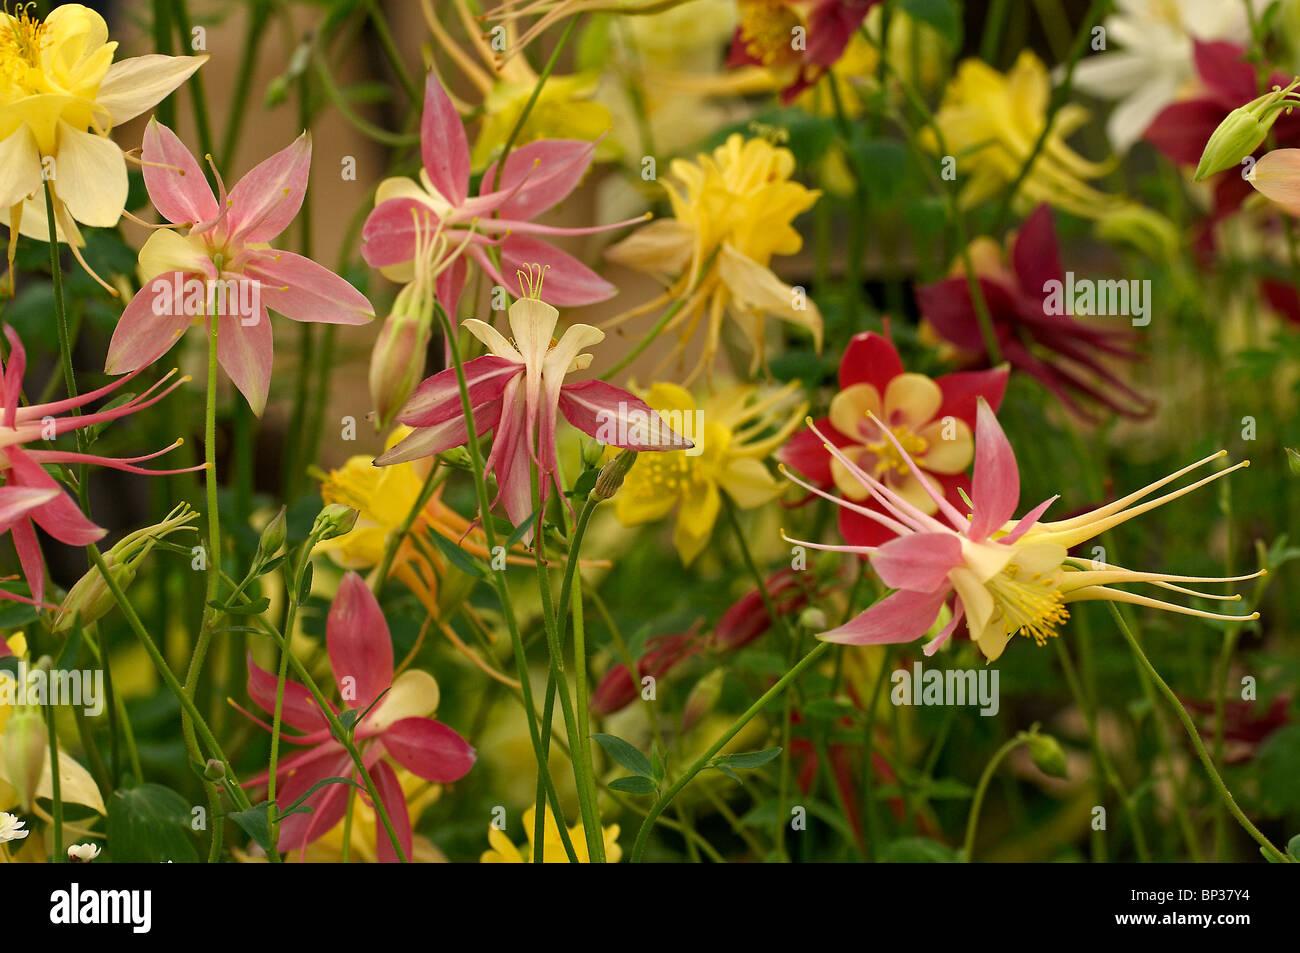 Close up of display of Hybrid Aquilegias 'Songbird Series' - Stock Image